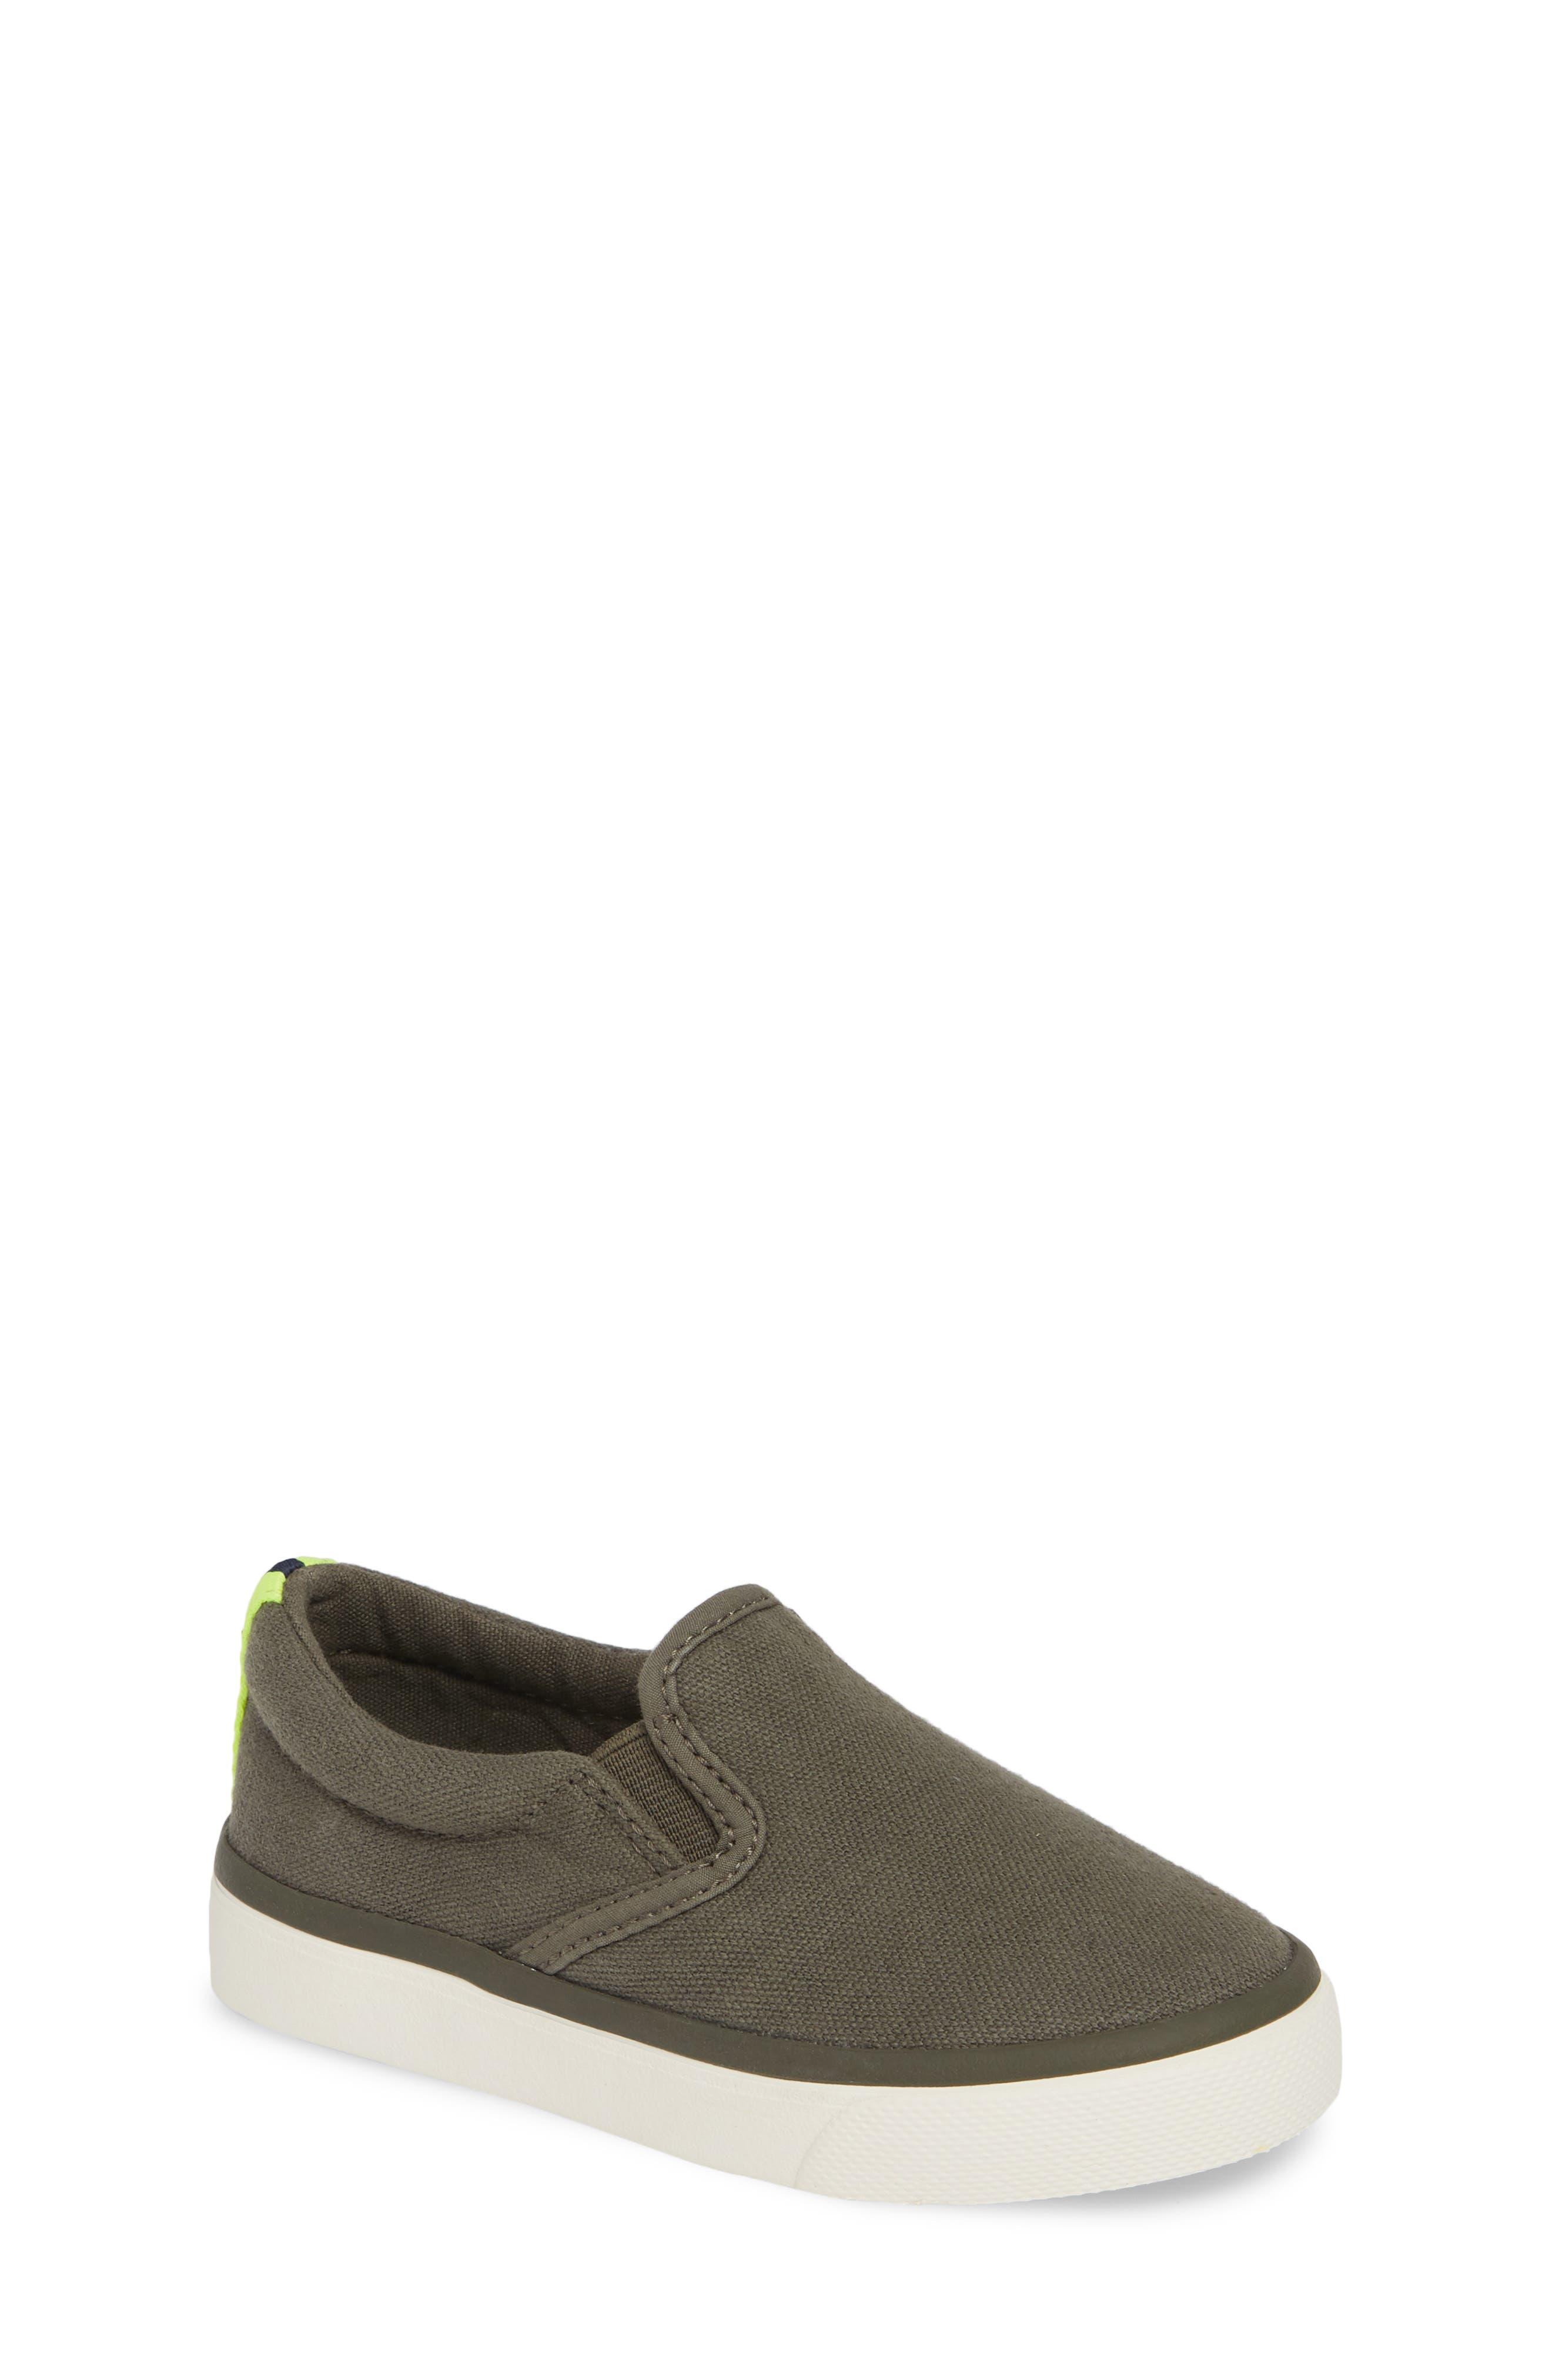 MINI BODEN Slip-On Sneaker, Main, color, ARMY GREEN